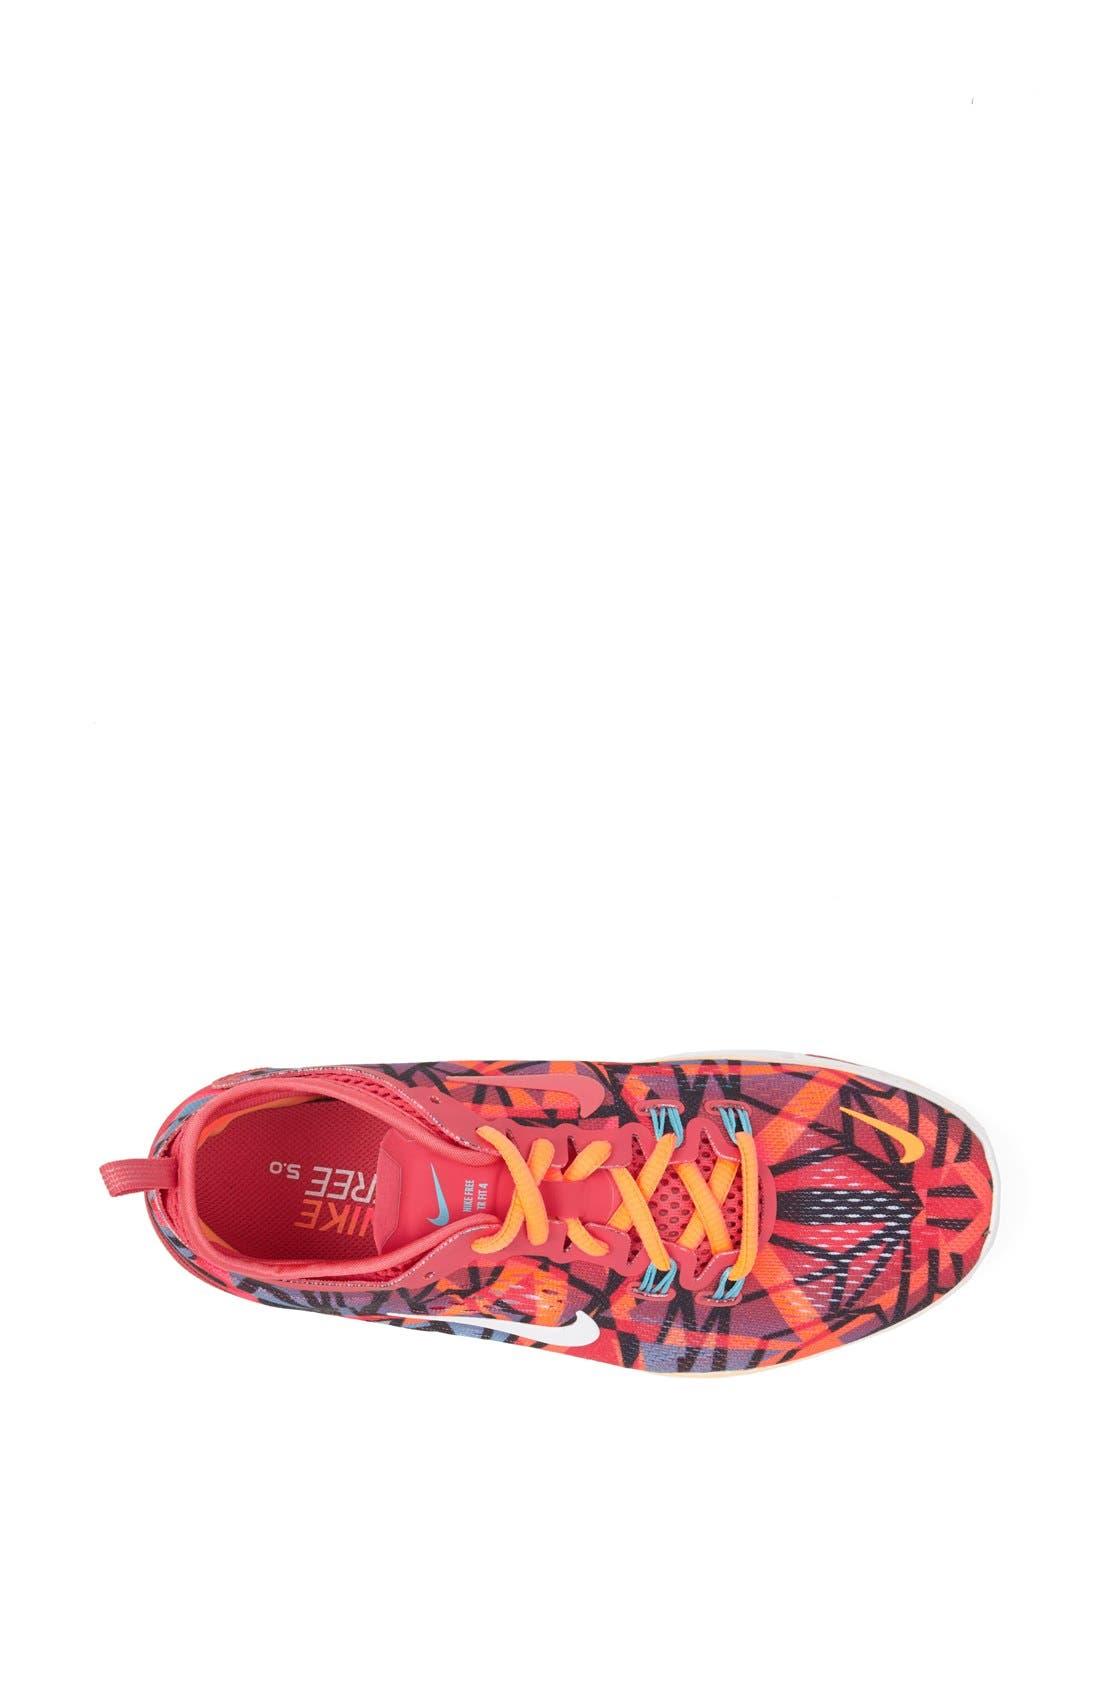 Alternate Image 3  - Nike 'Free 5.0 TR Fit 4' Print Training Shoe (Women)